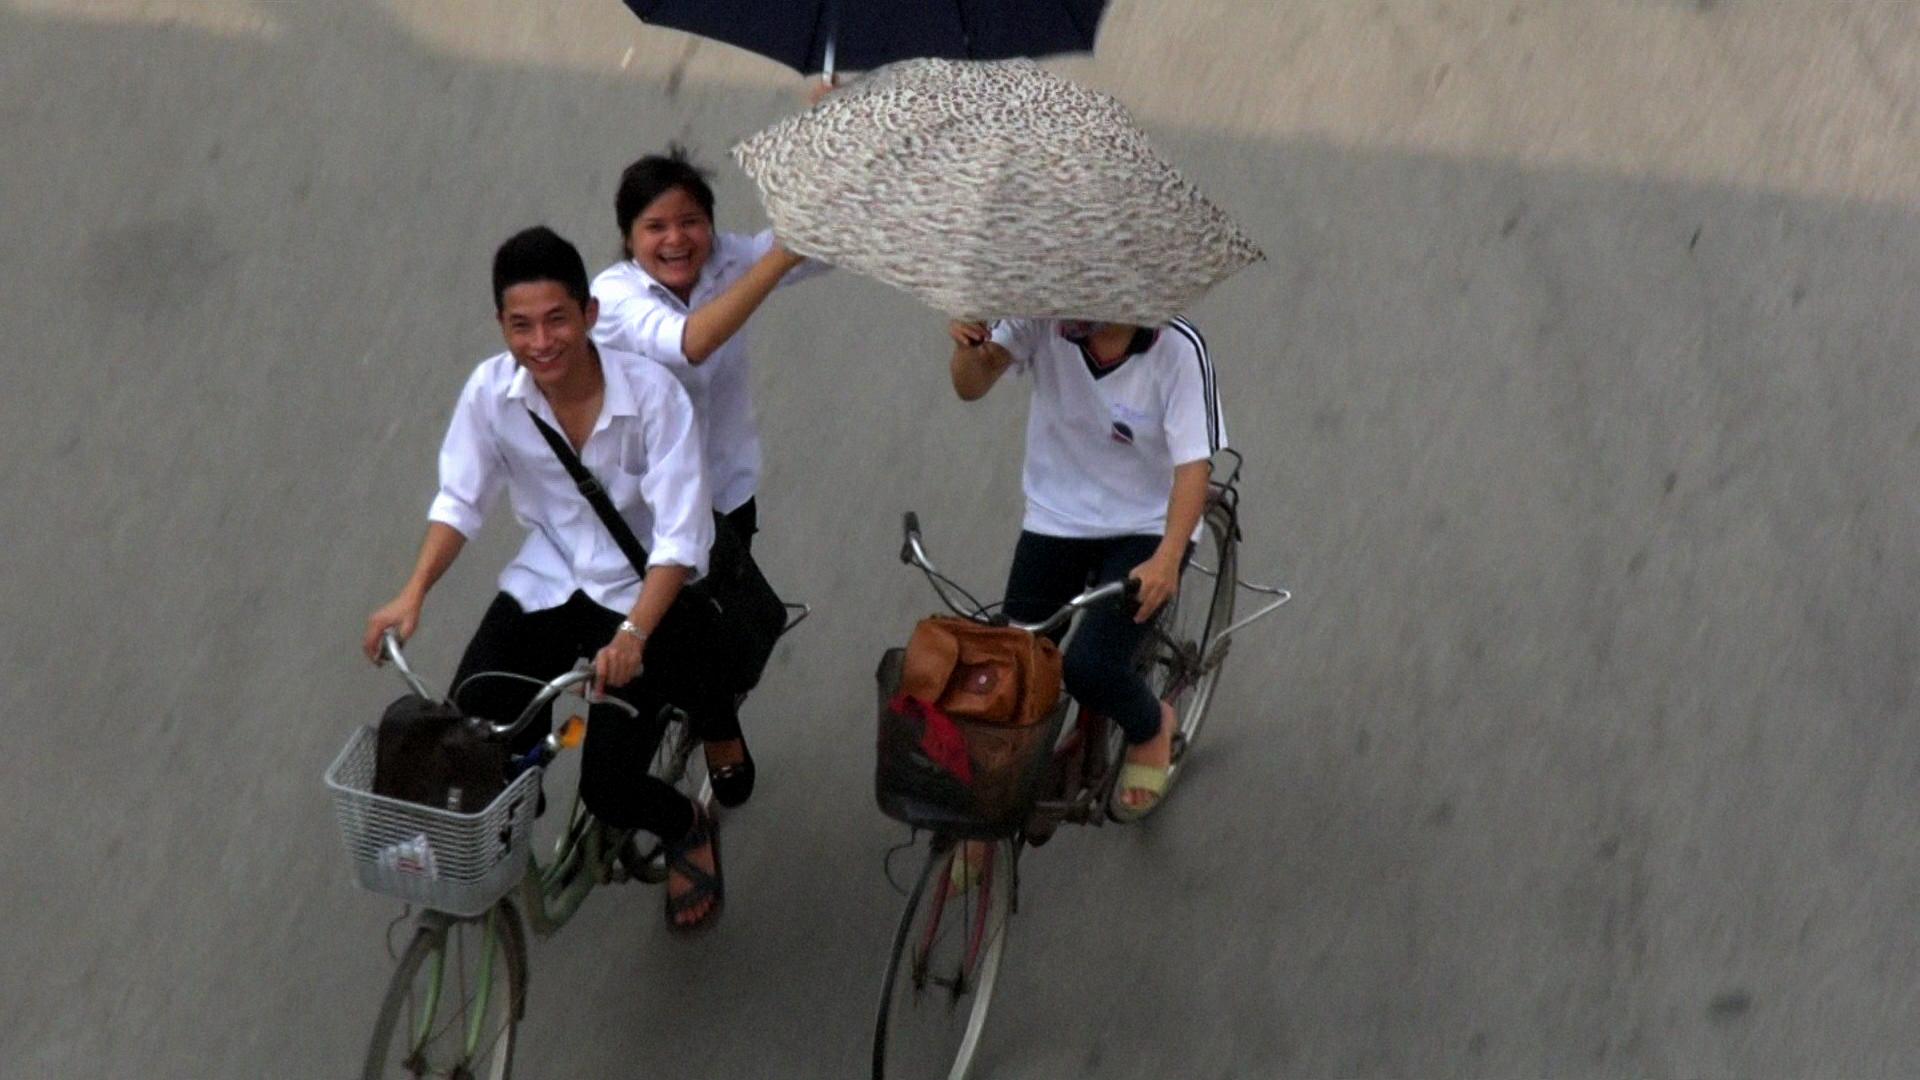 swapping umbrellas on bikes hanoi